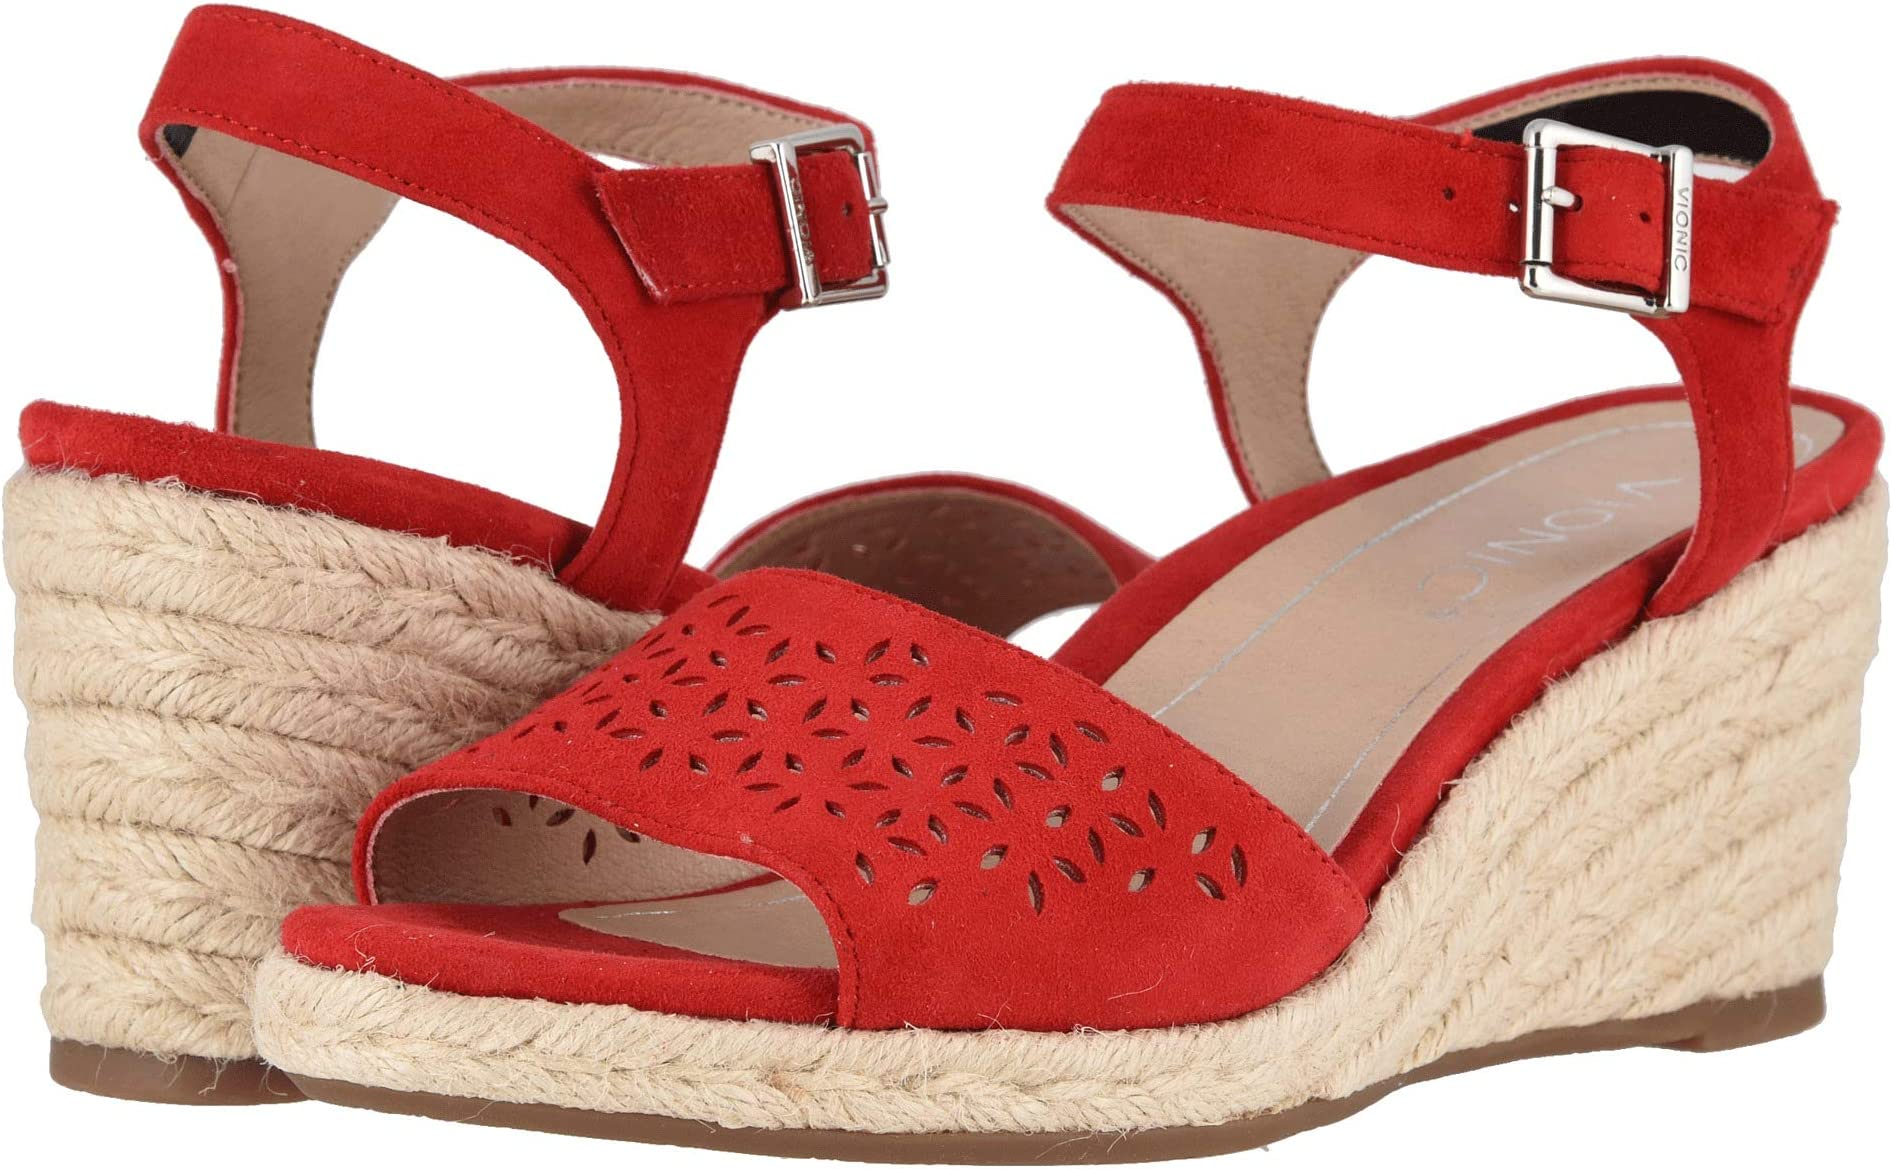 fb837eea1d44 Vionic Sandals